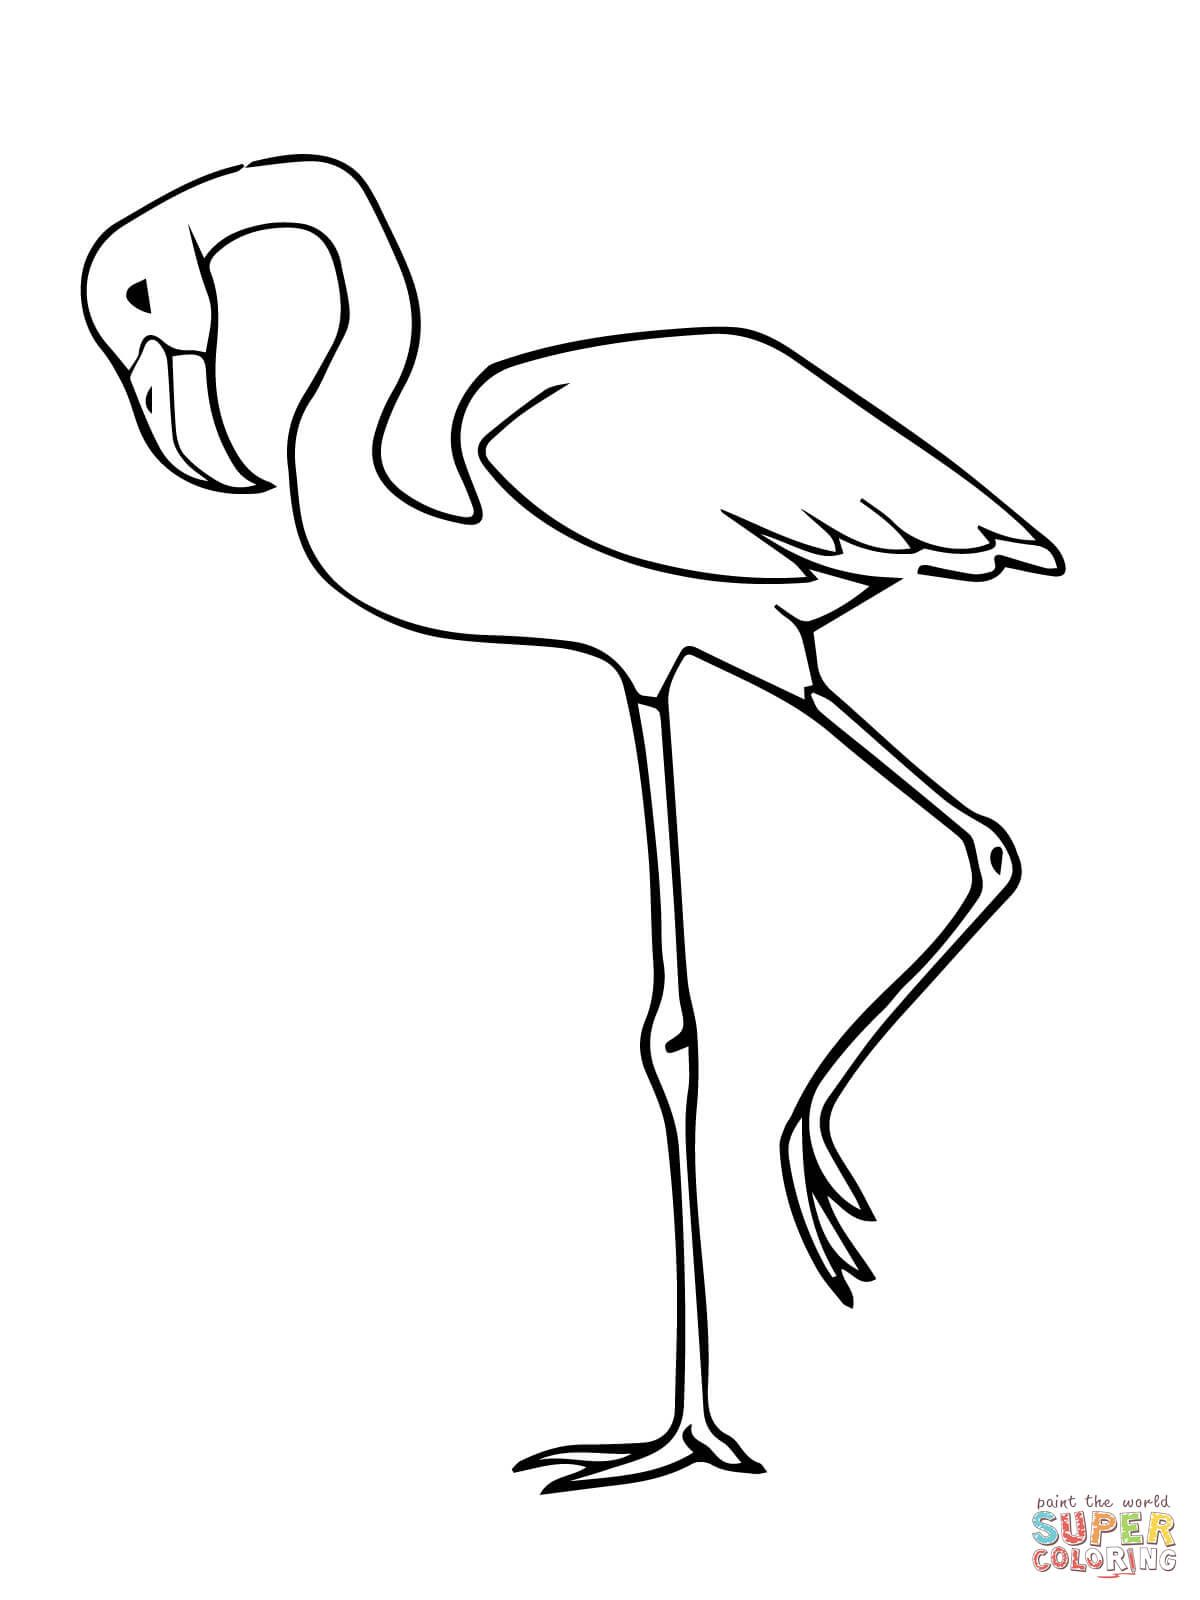 pinkflamingobirdcoloringpage.jpg (1200×1600